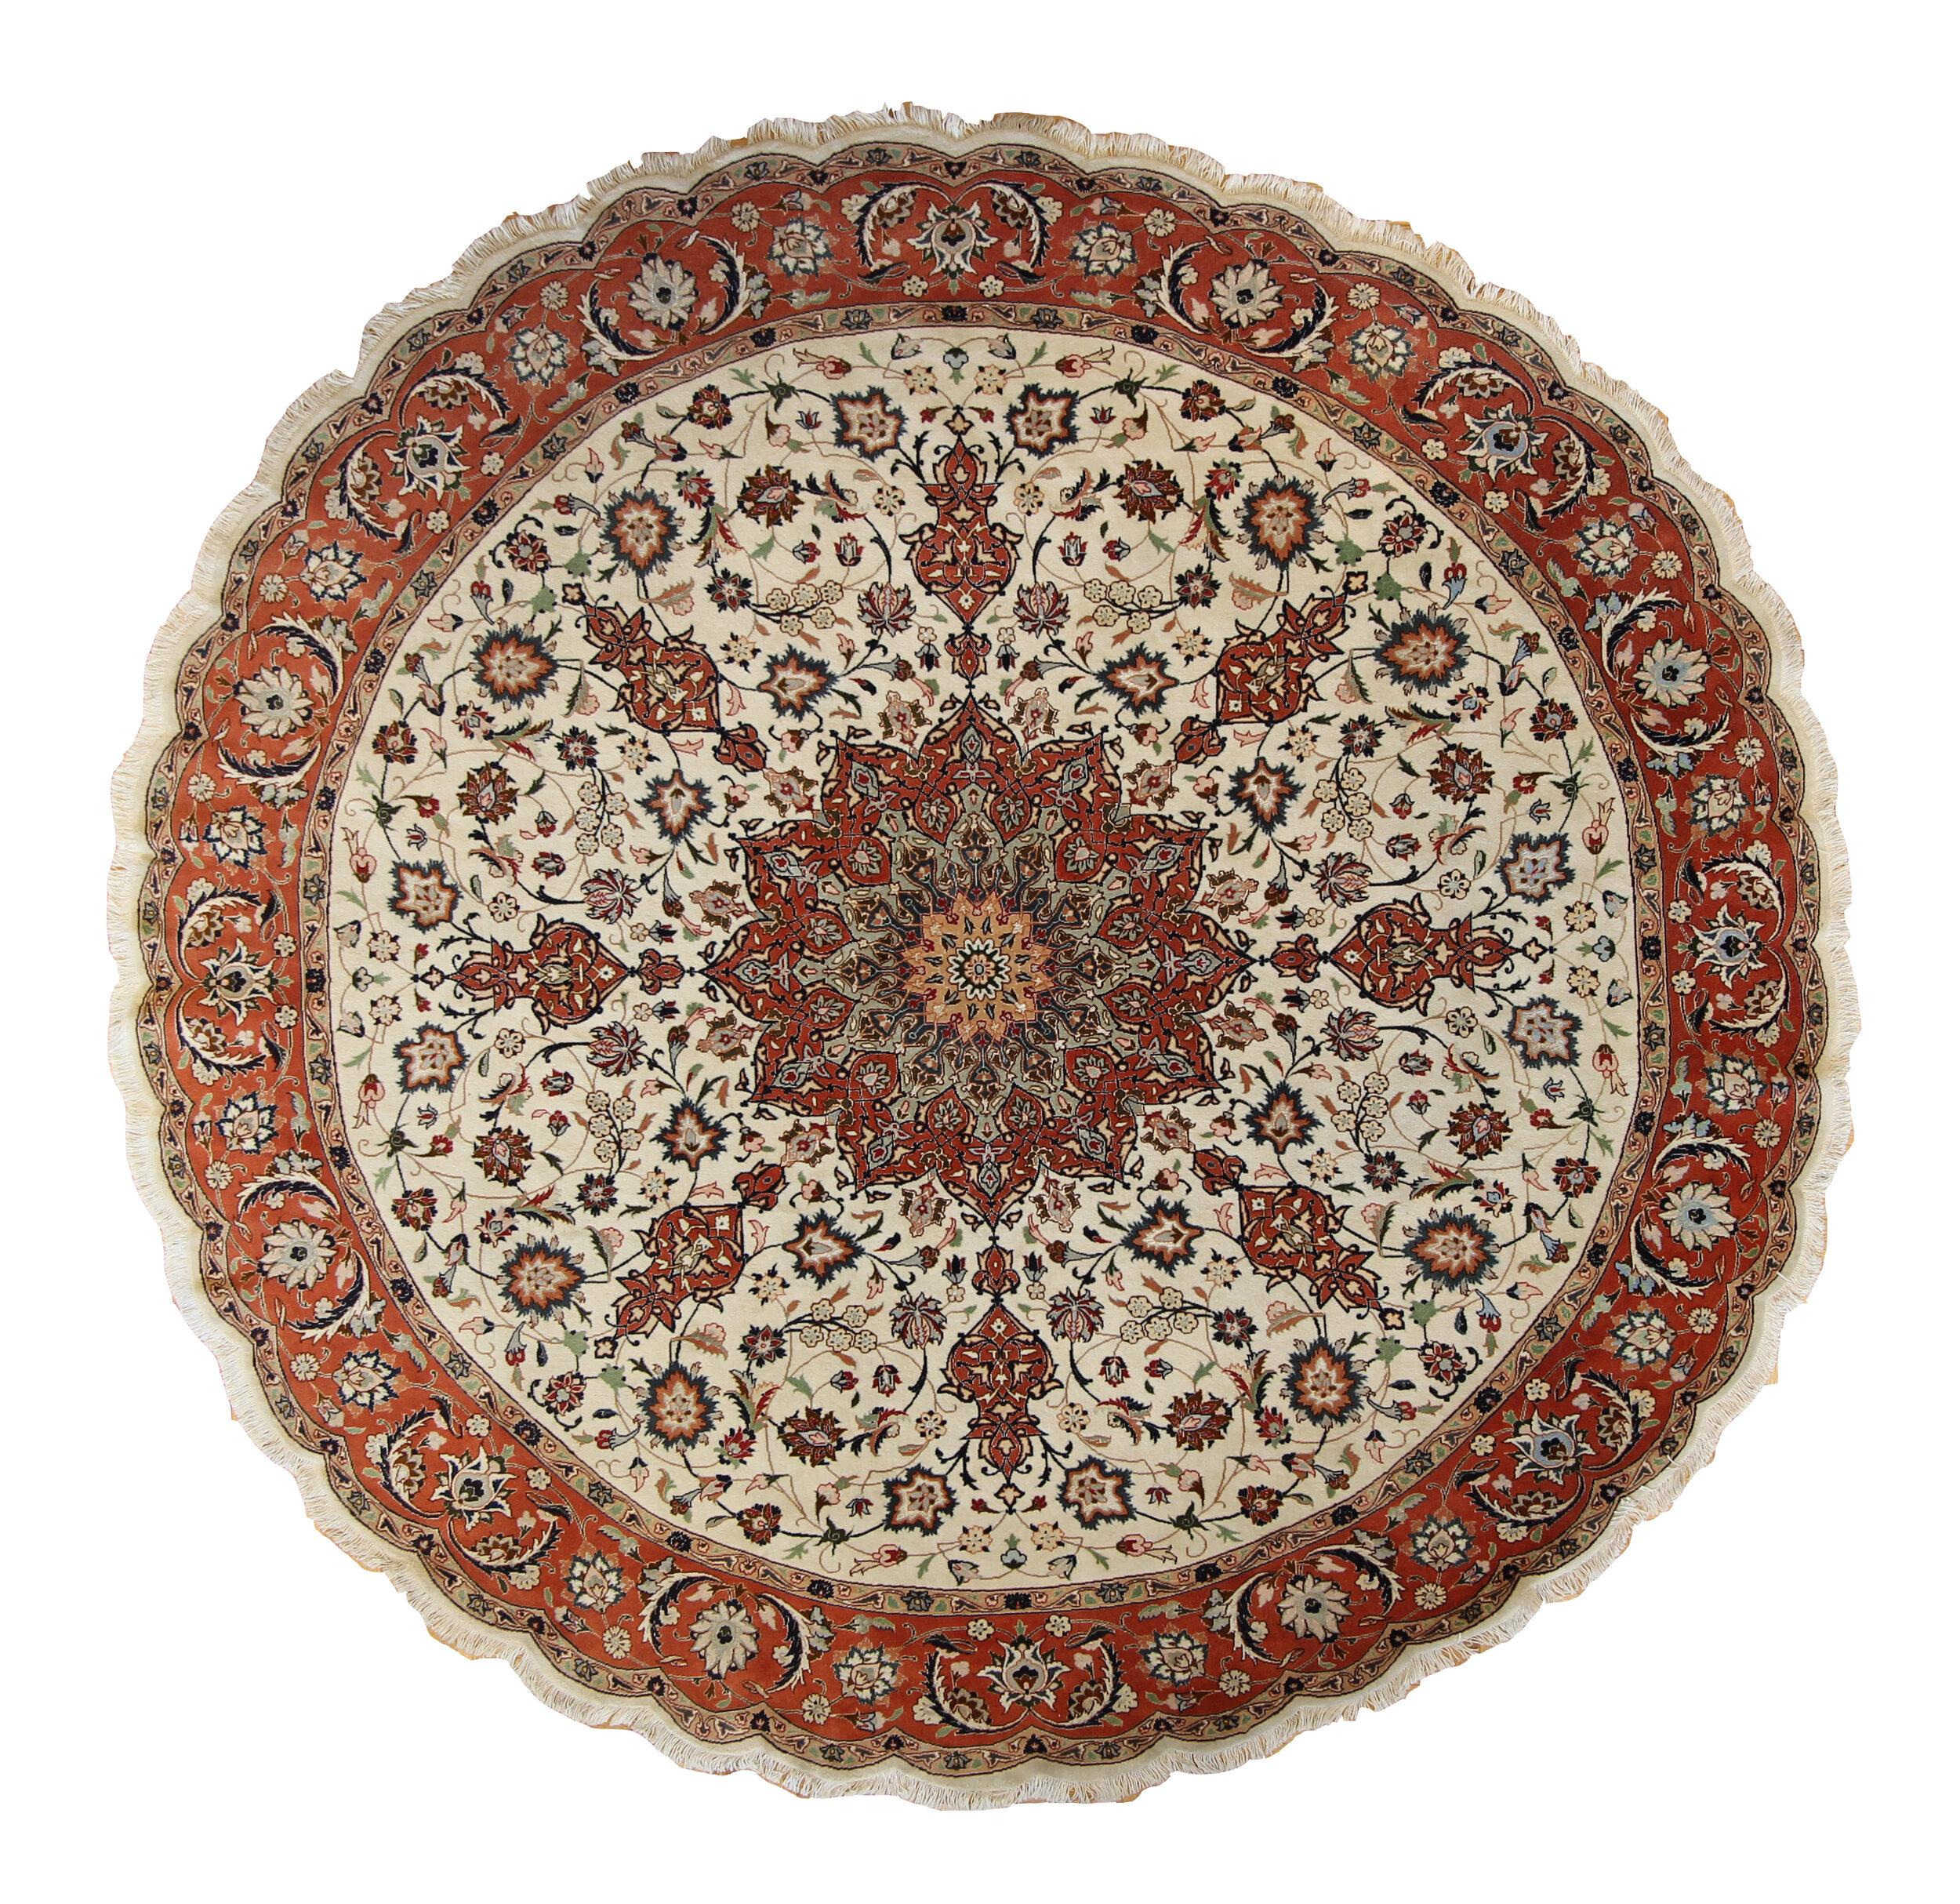 CC27 Tabriz, Persian, 7' round